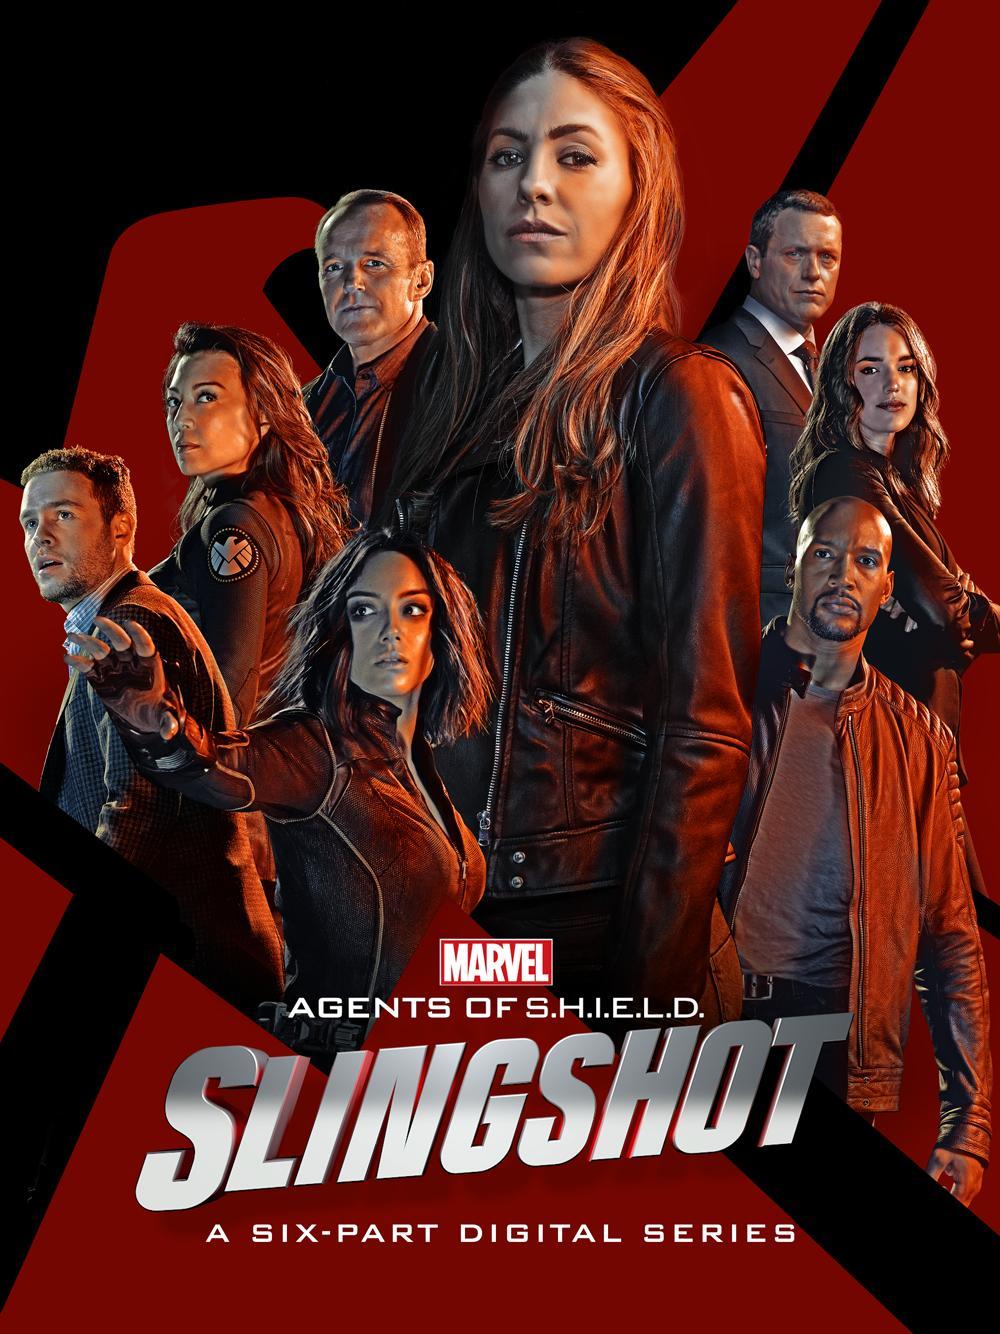 Agents of S.H.I.E.L.D.: Slingshot (S01)